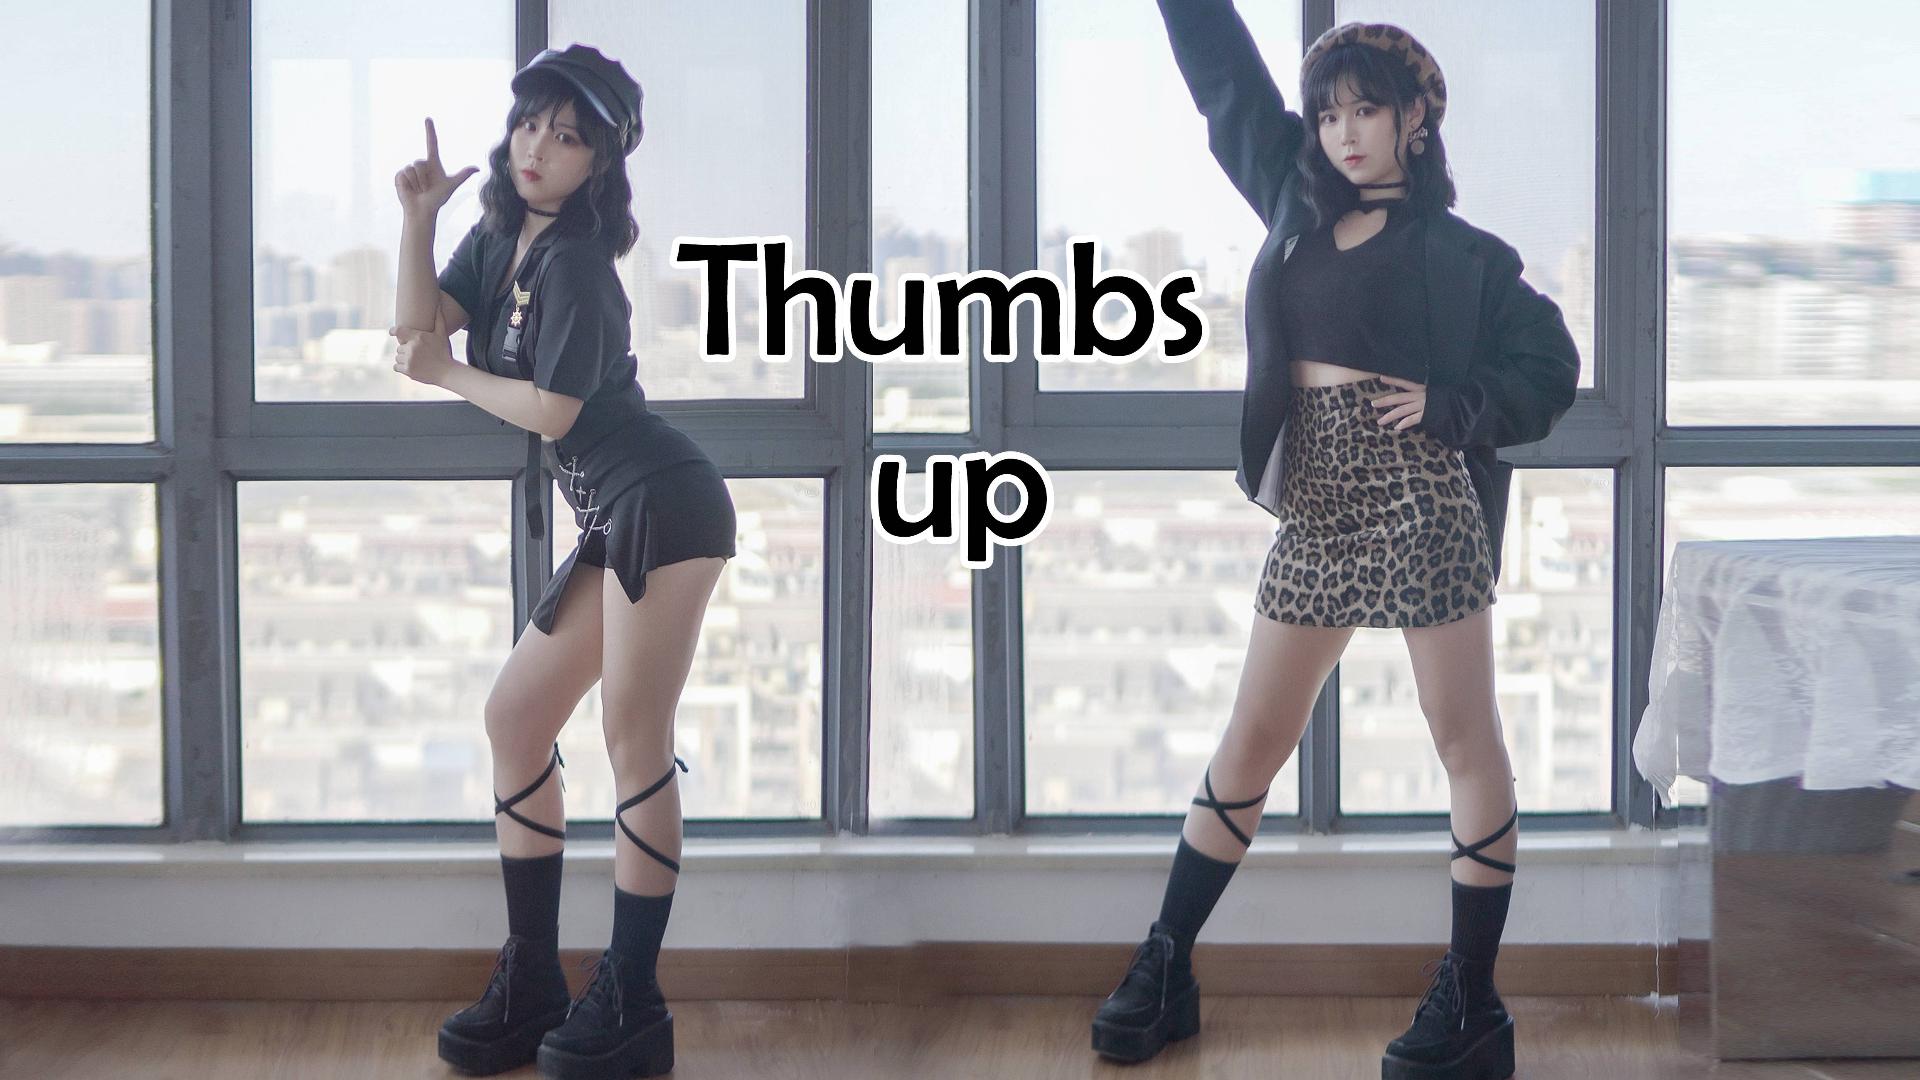 【嘉也子】肉感十足—thumbs up—